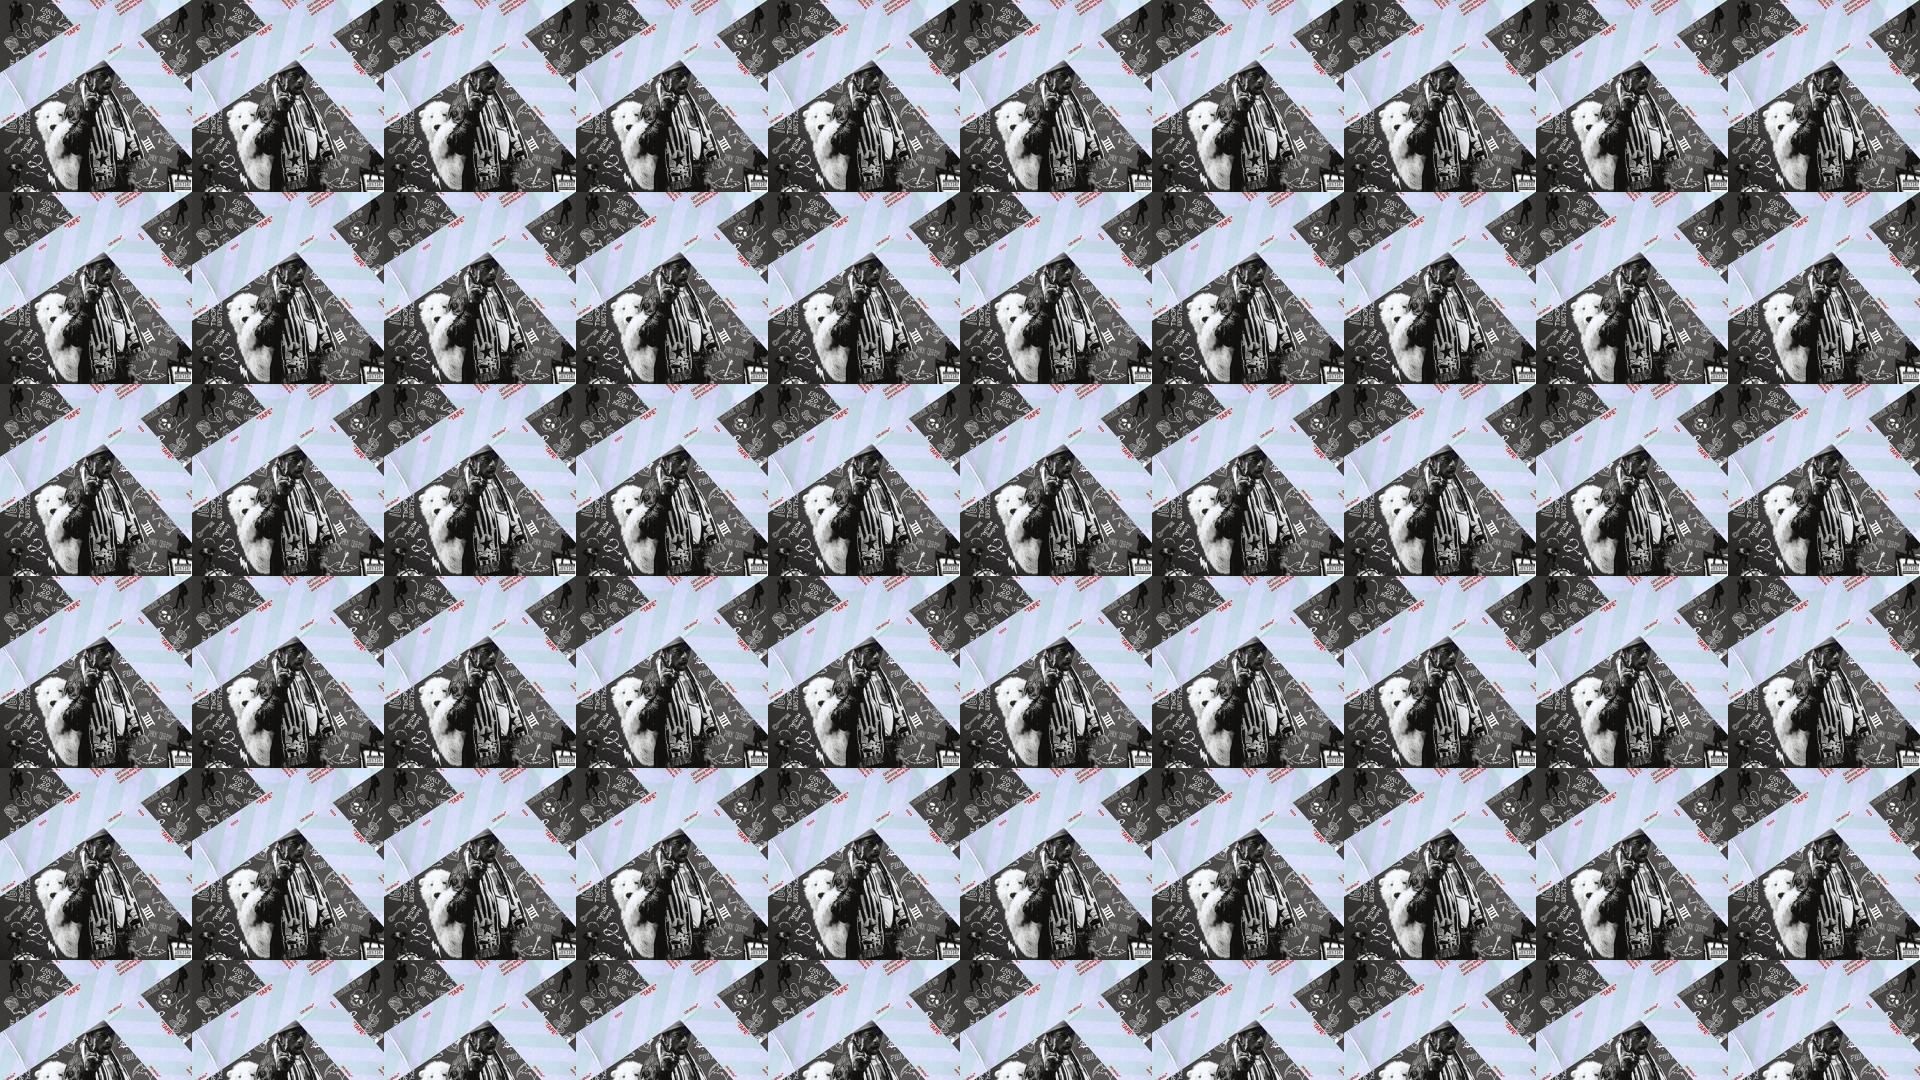 Lil Uzi Vert Wallpaper Tiled Desktop Wallpaper